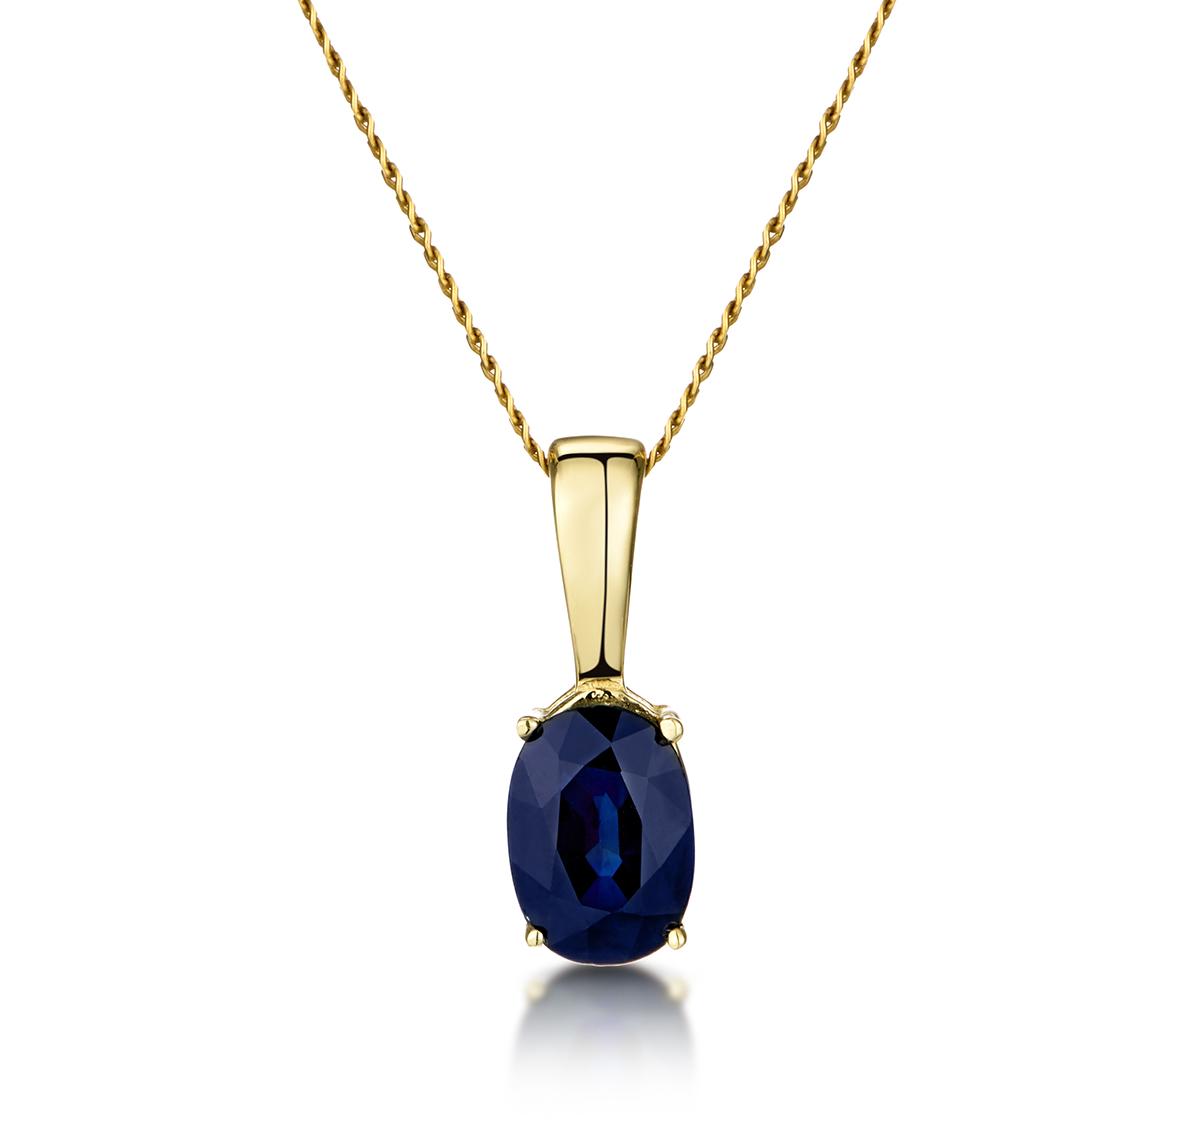 Sapphire 7 x 5 mm 9K Yellow Gold Pendant